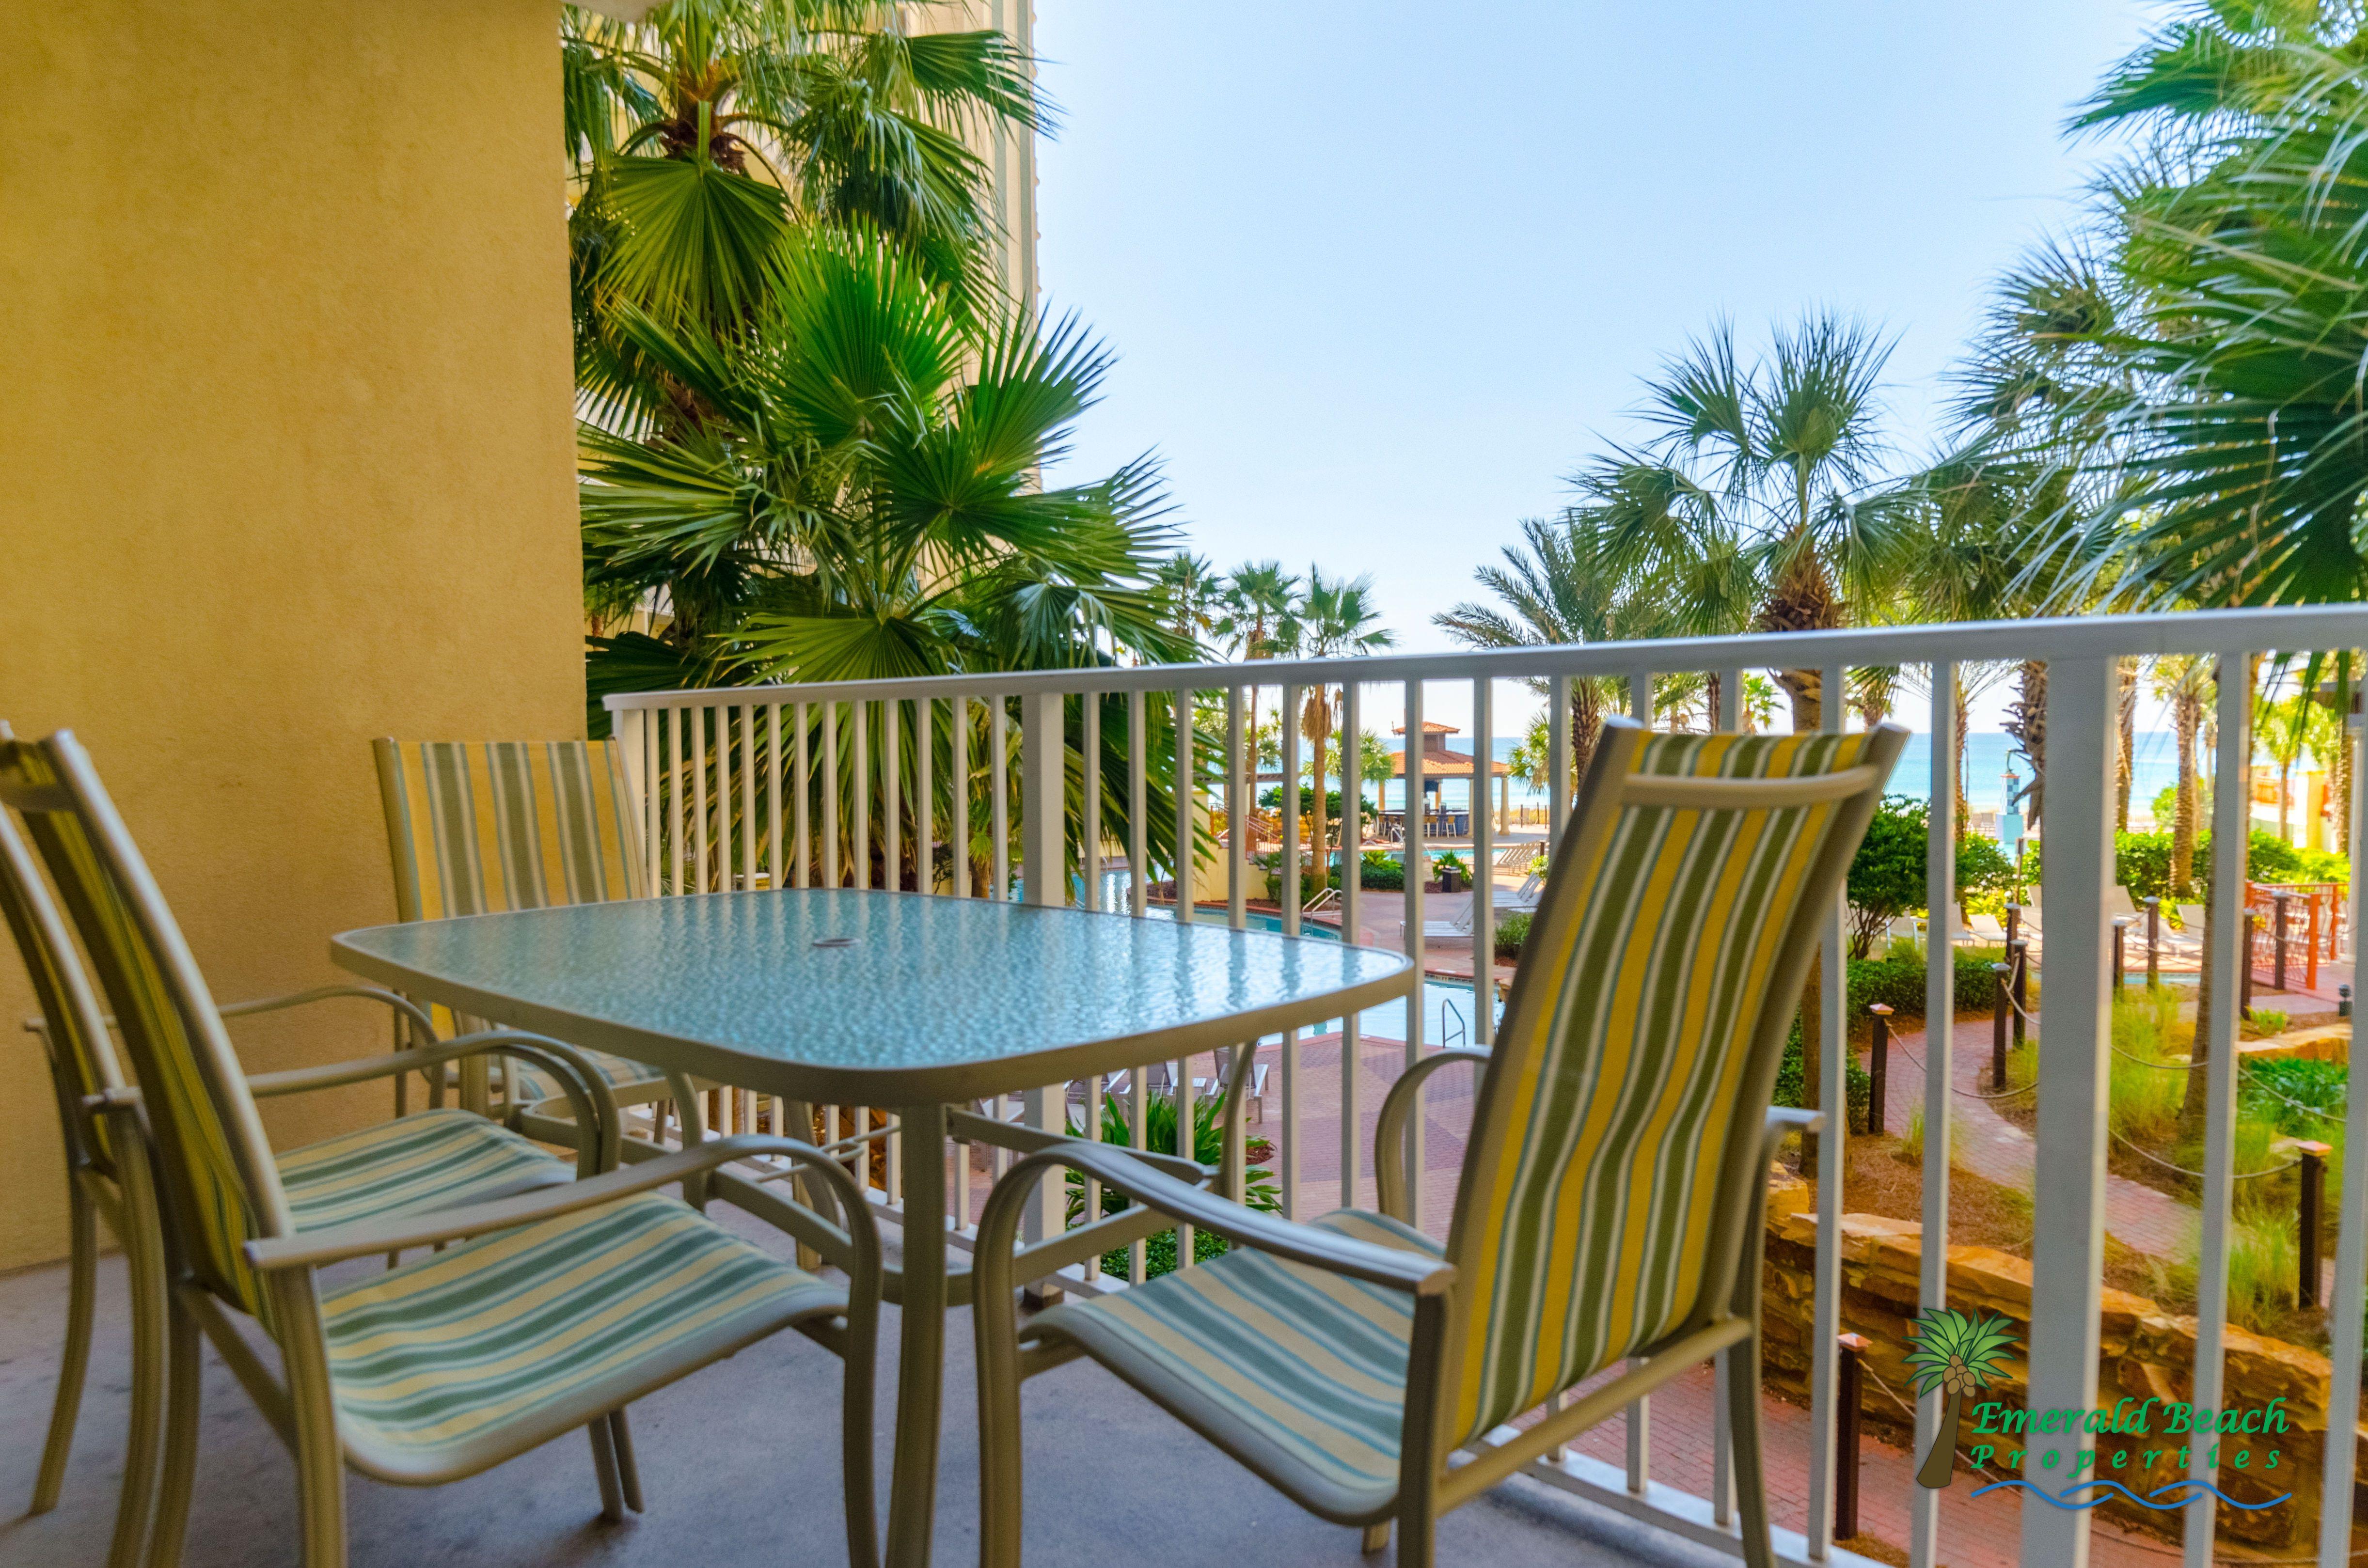 Pin By Emerald Beach Properties Inc On Palm Island Shores Of Panama 218 Panama City Beach Fl Beach Properties Beach Condo Rentals Panama City Beach Condos